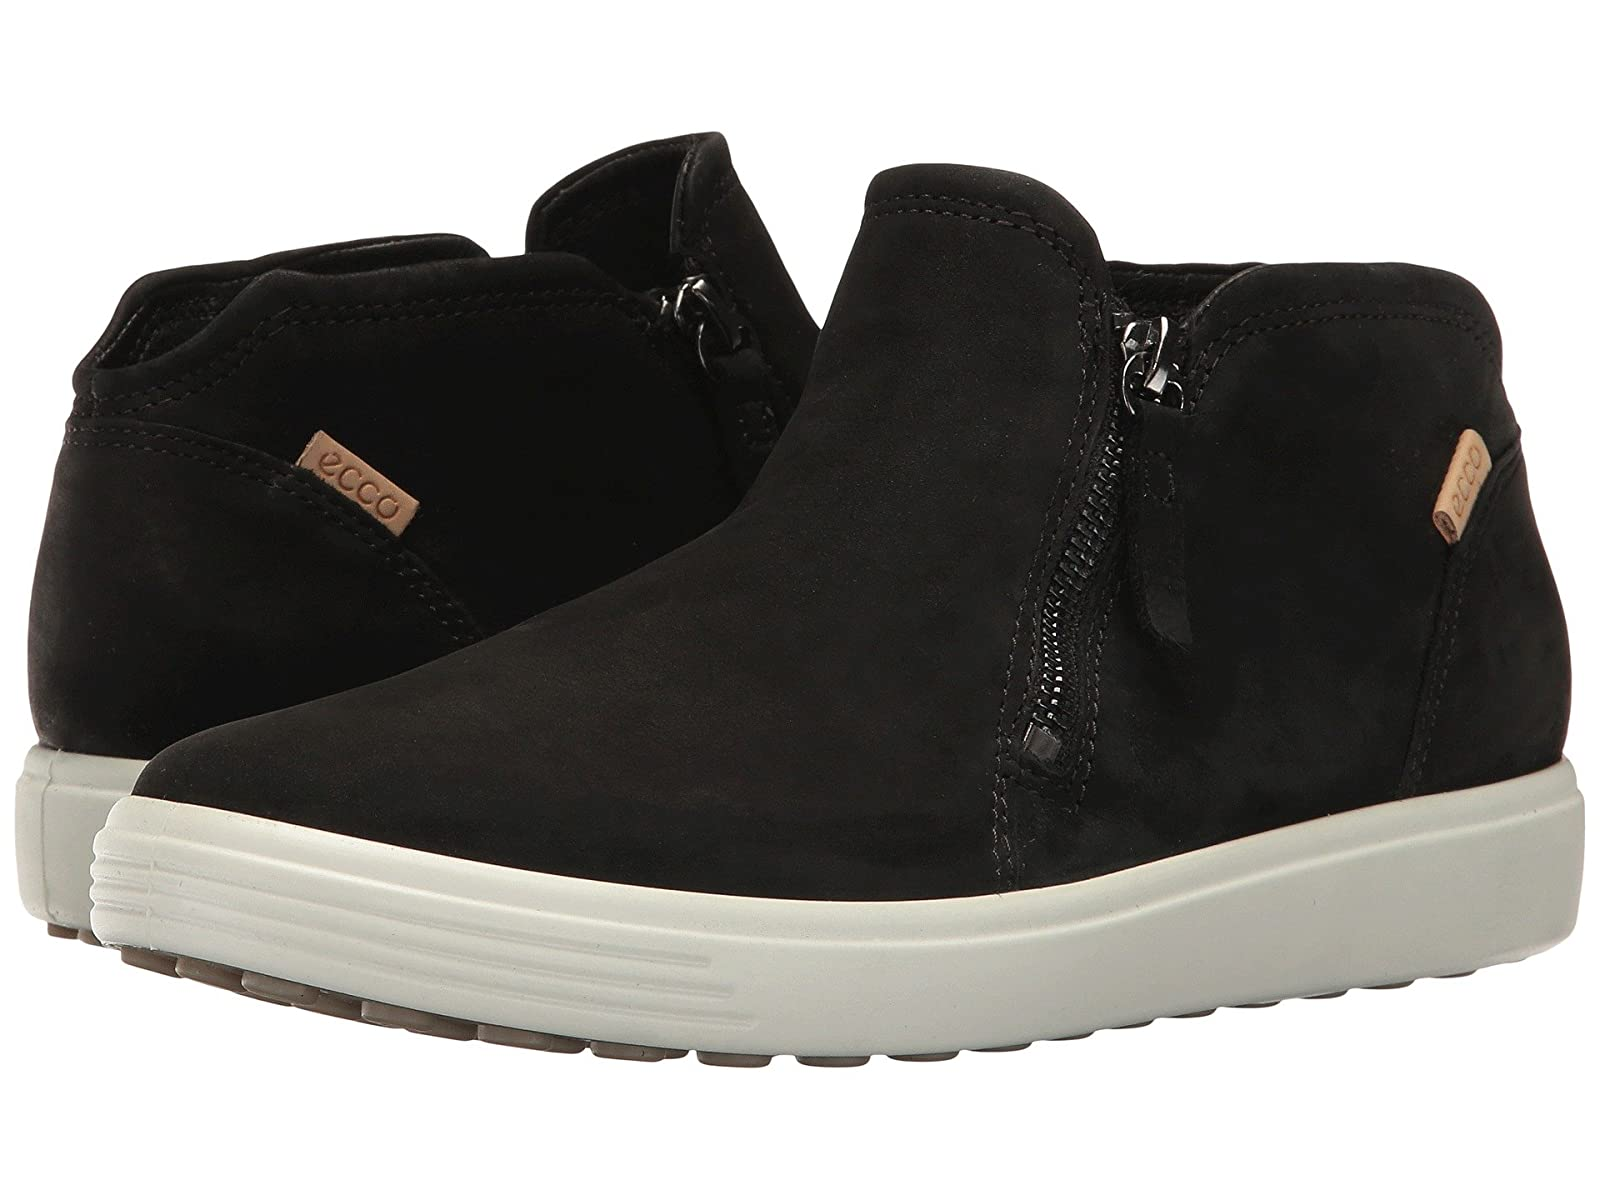 ECCO Soft 7 Low Cut Zip BootieAtmospheric grades have affordable shoes